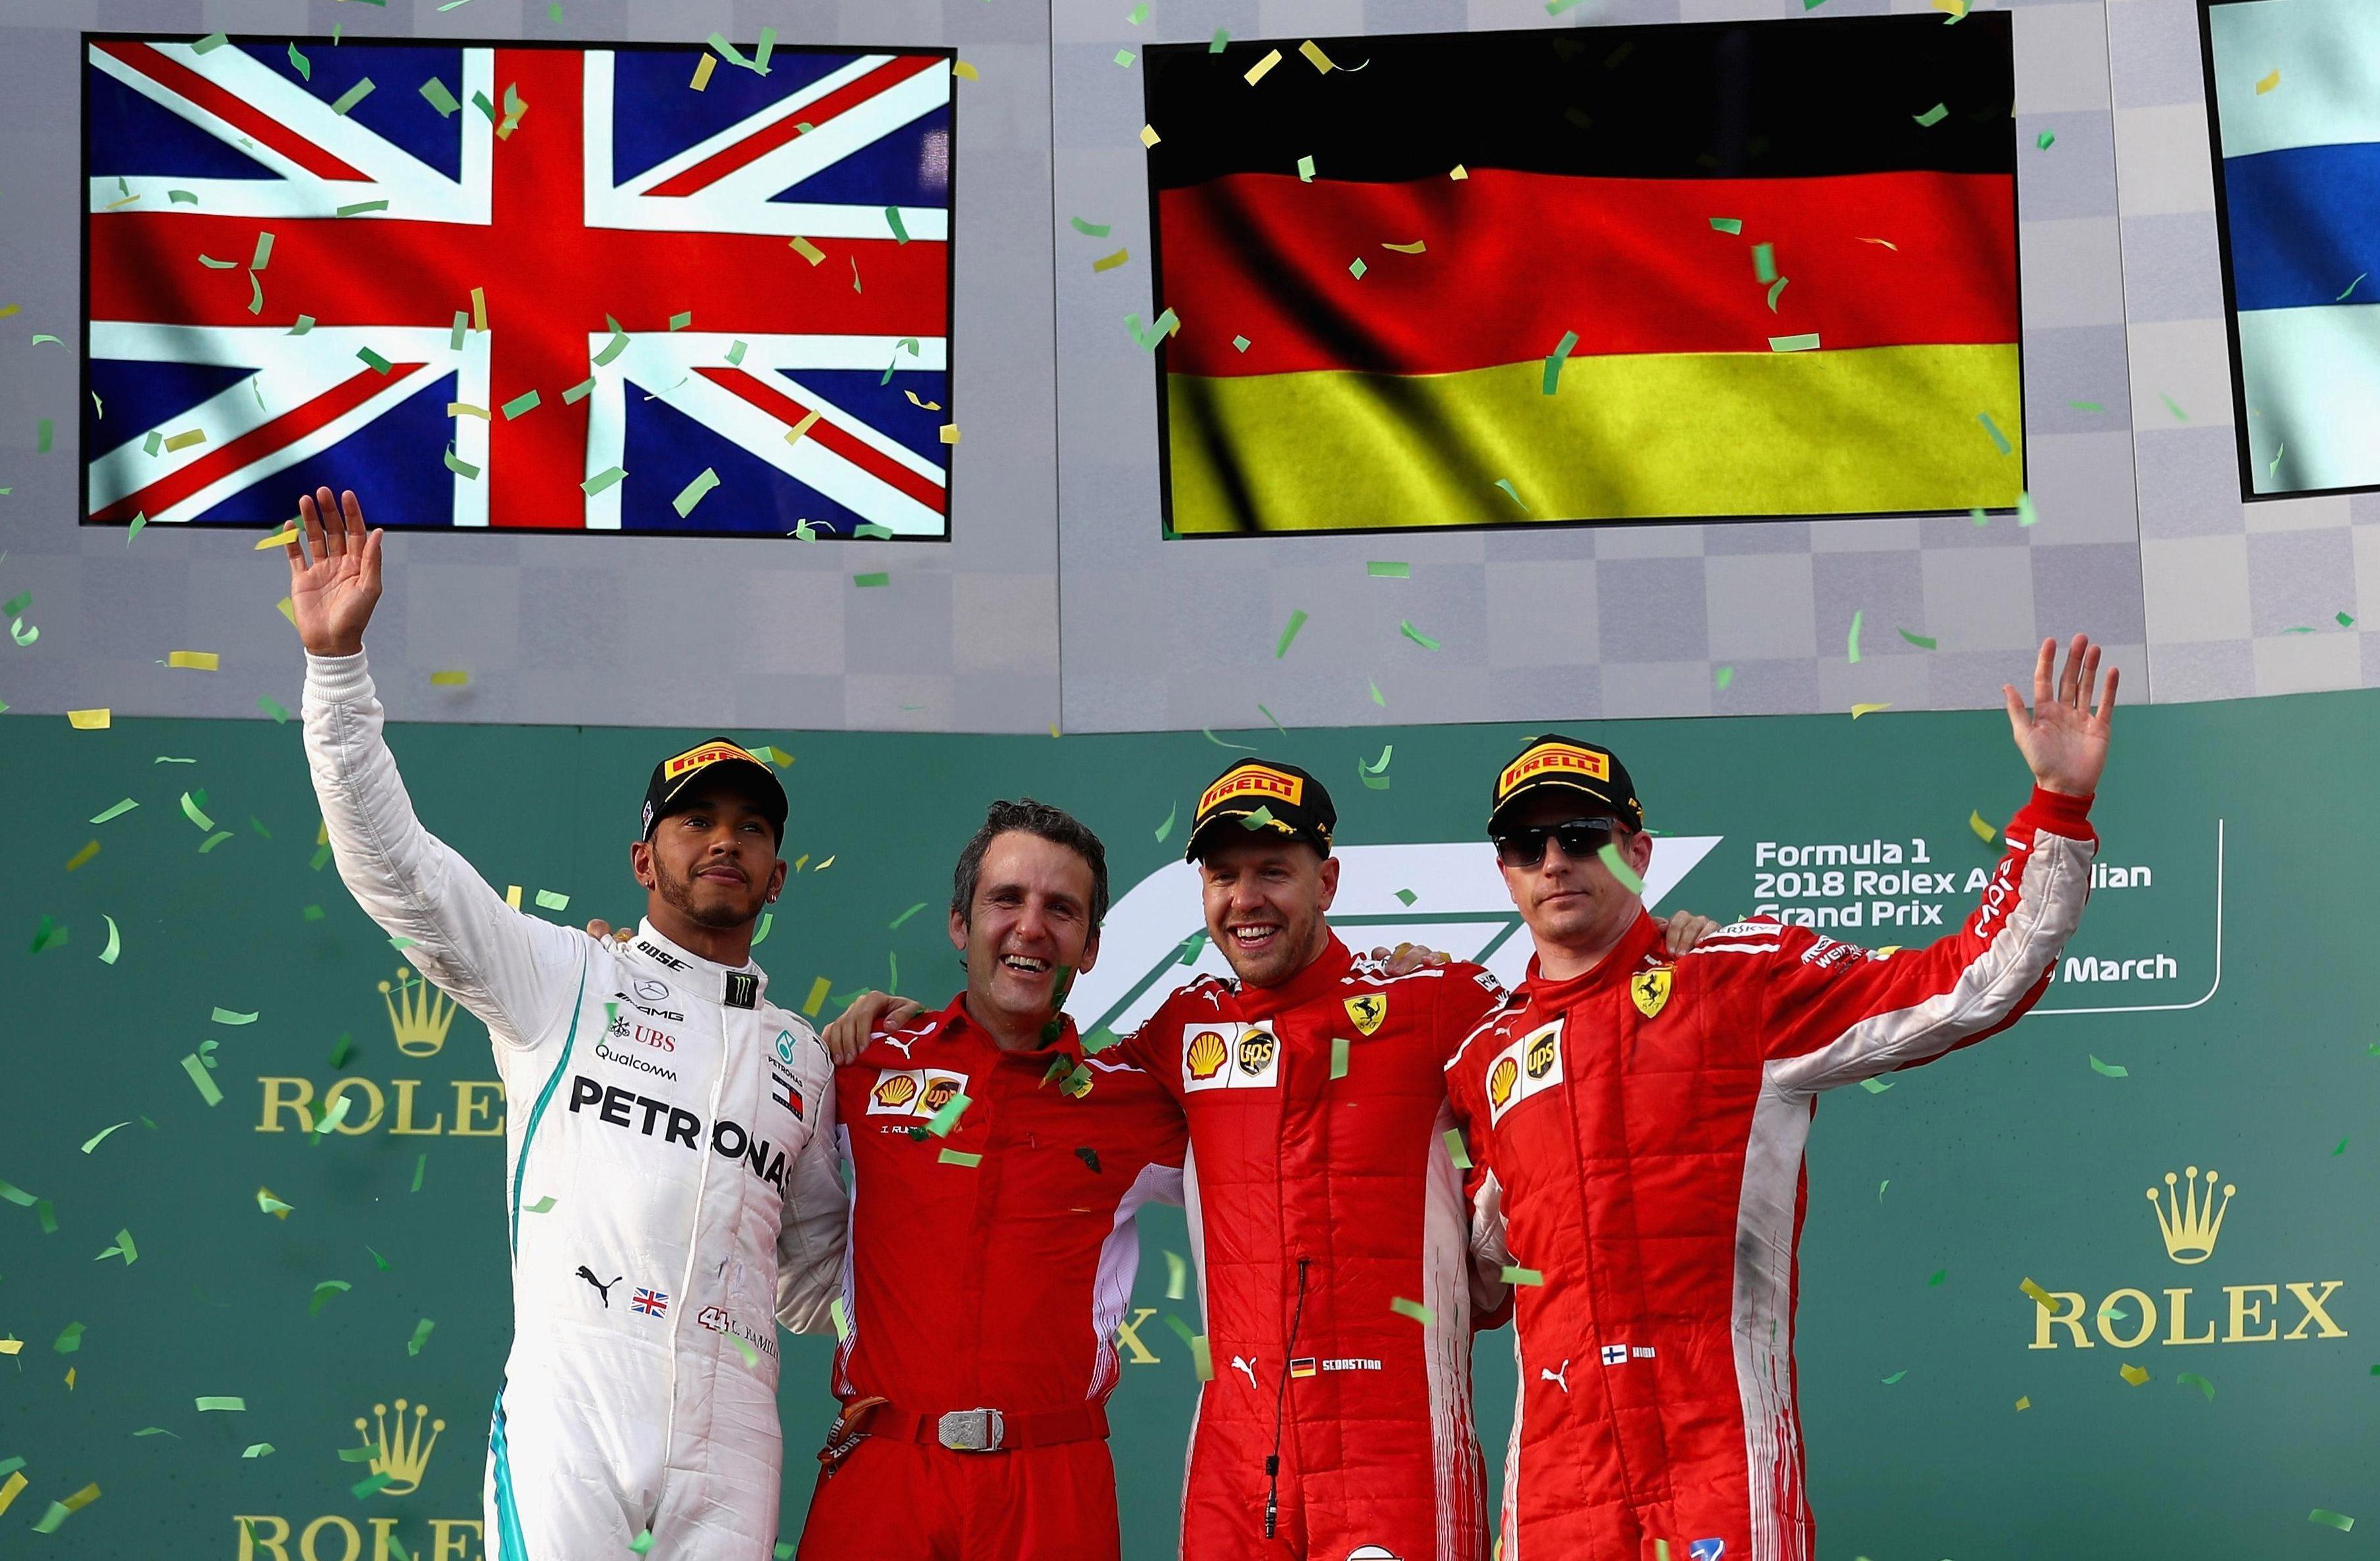 Top three Lewis Hamilton, Kimi Raikkonen, Sebastian Vettel celebrate on podium